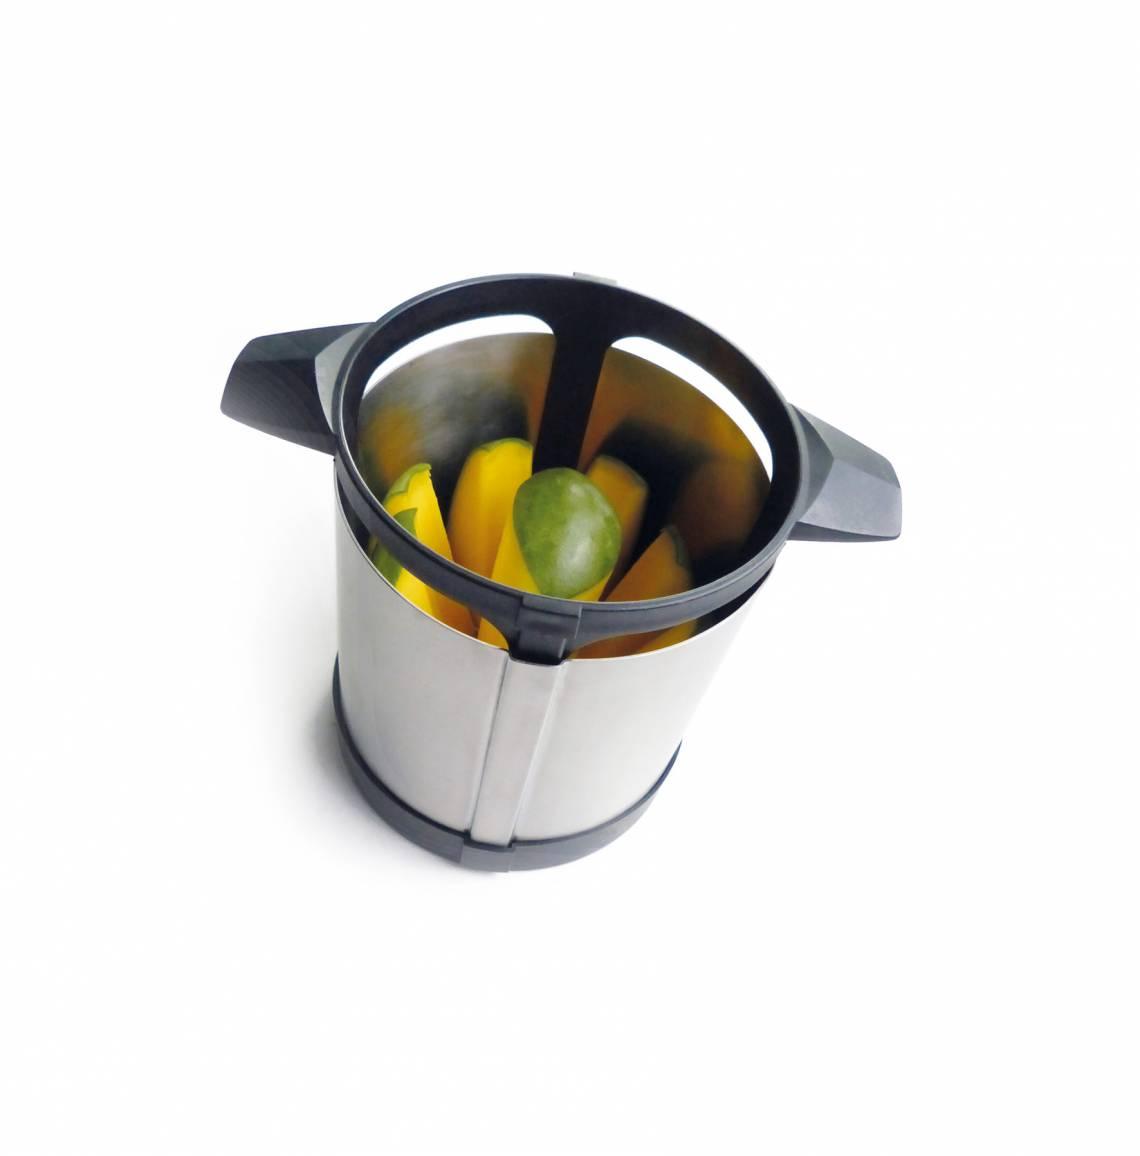 homiez mangoWhizz Mangoschneider 1